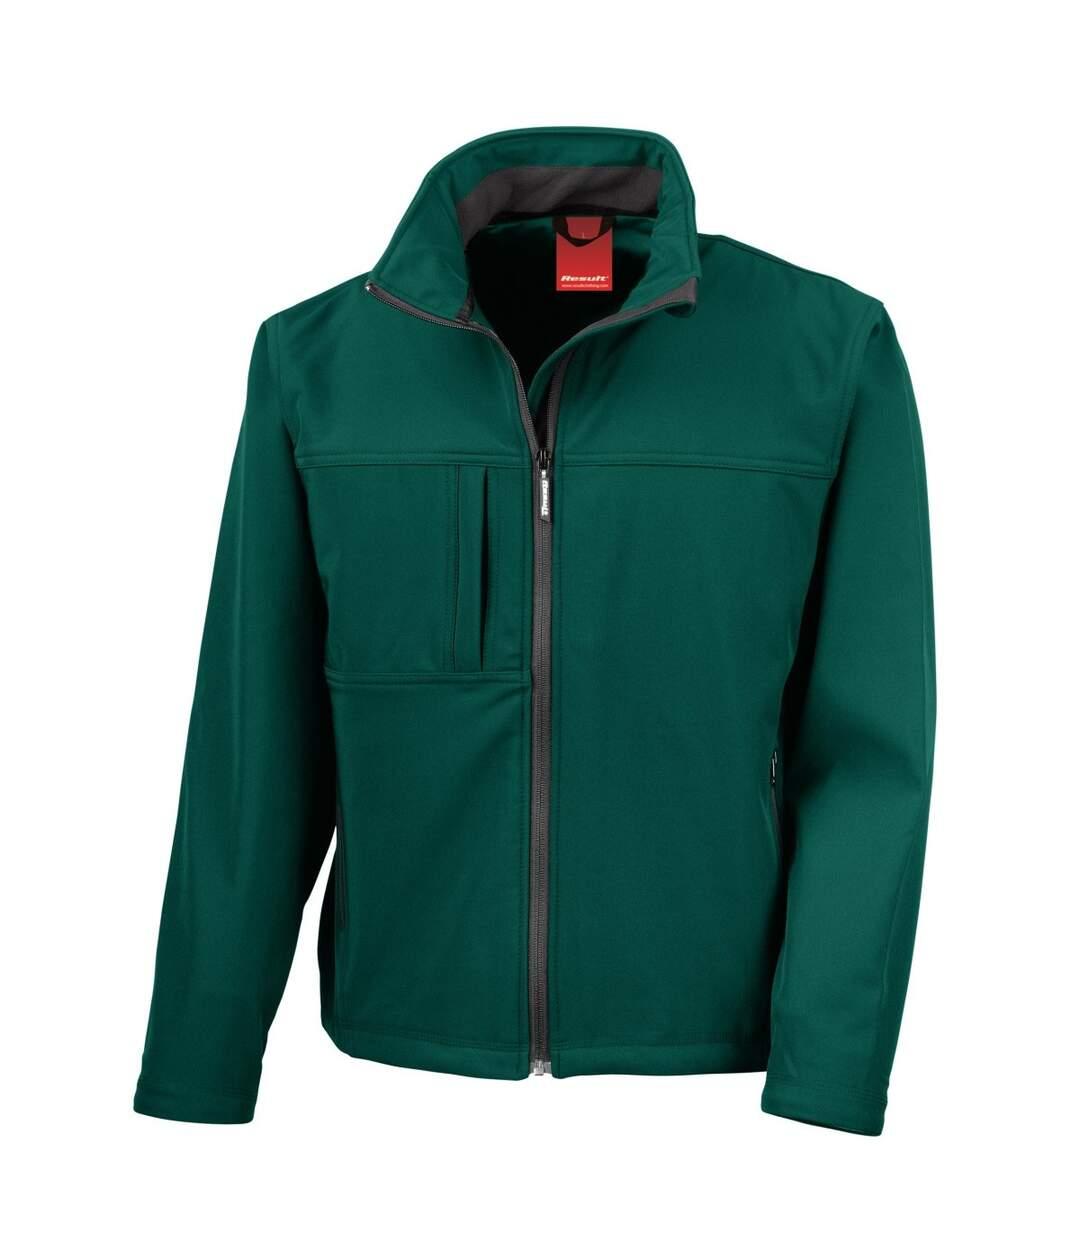 Result Mens Softshell Premium 3 Layer Performance Jacket (Waterproof, Windproof & Breathable) (Bottle Green) - UTBC2046